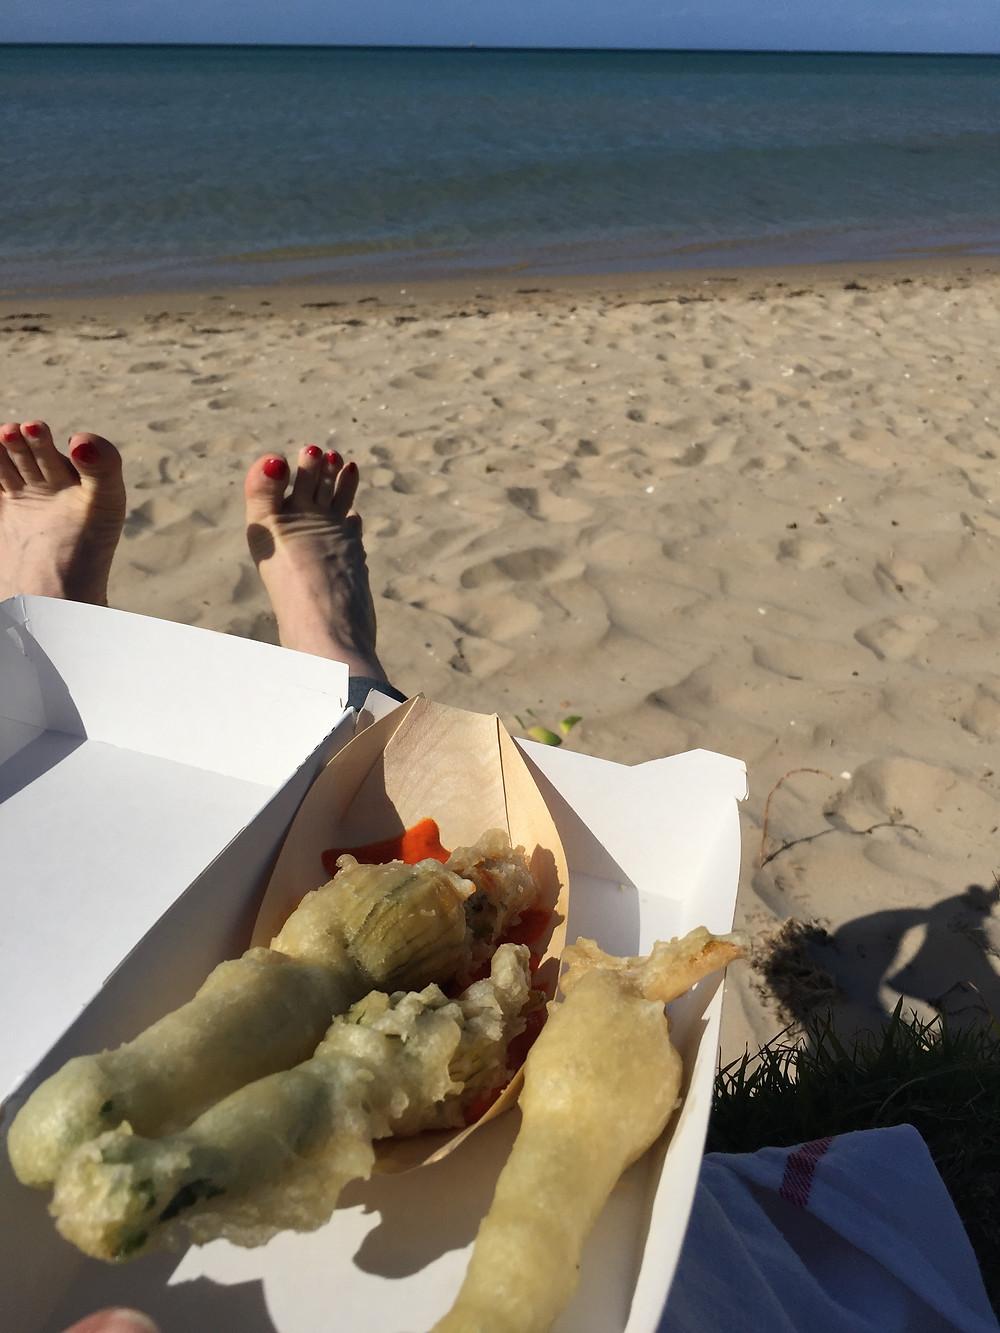 ZUCCHINI FLOWERS ON THE BEACH